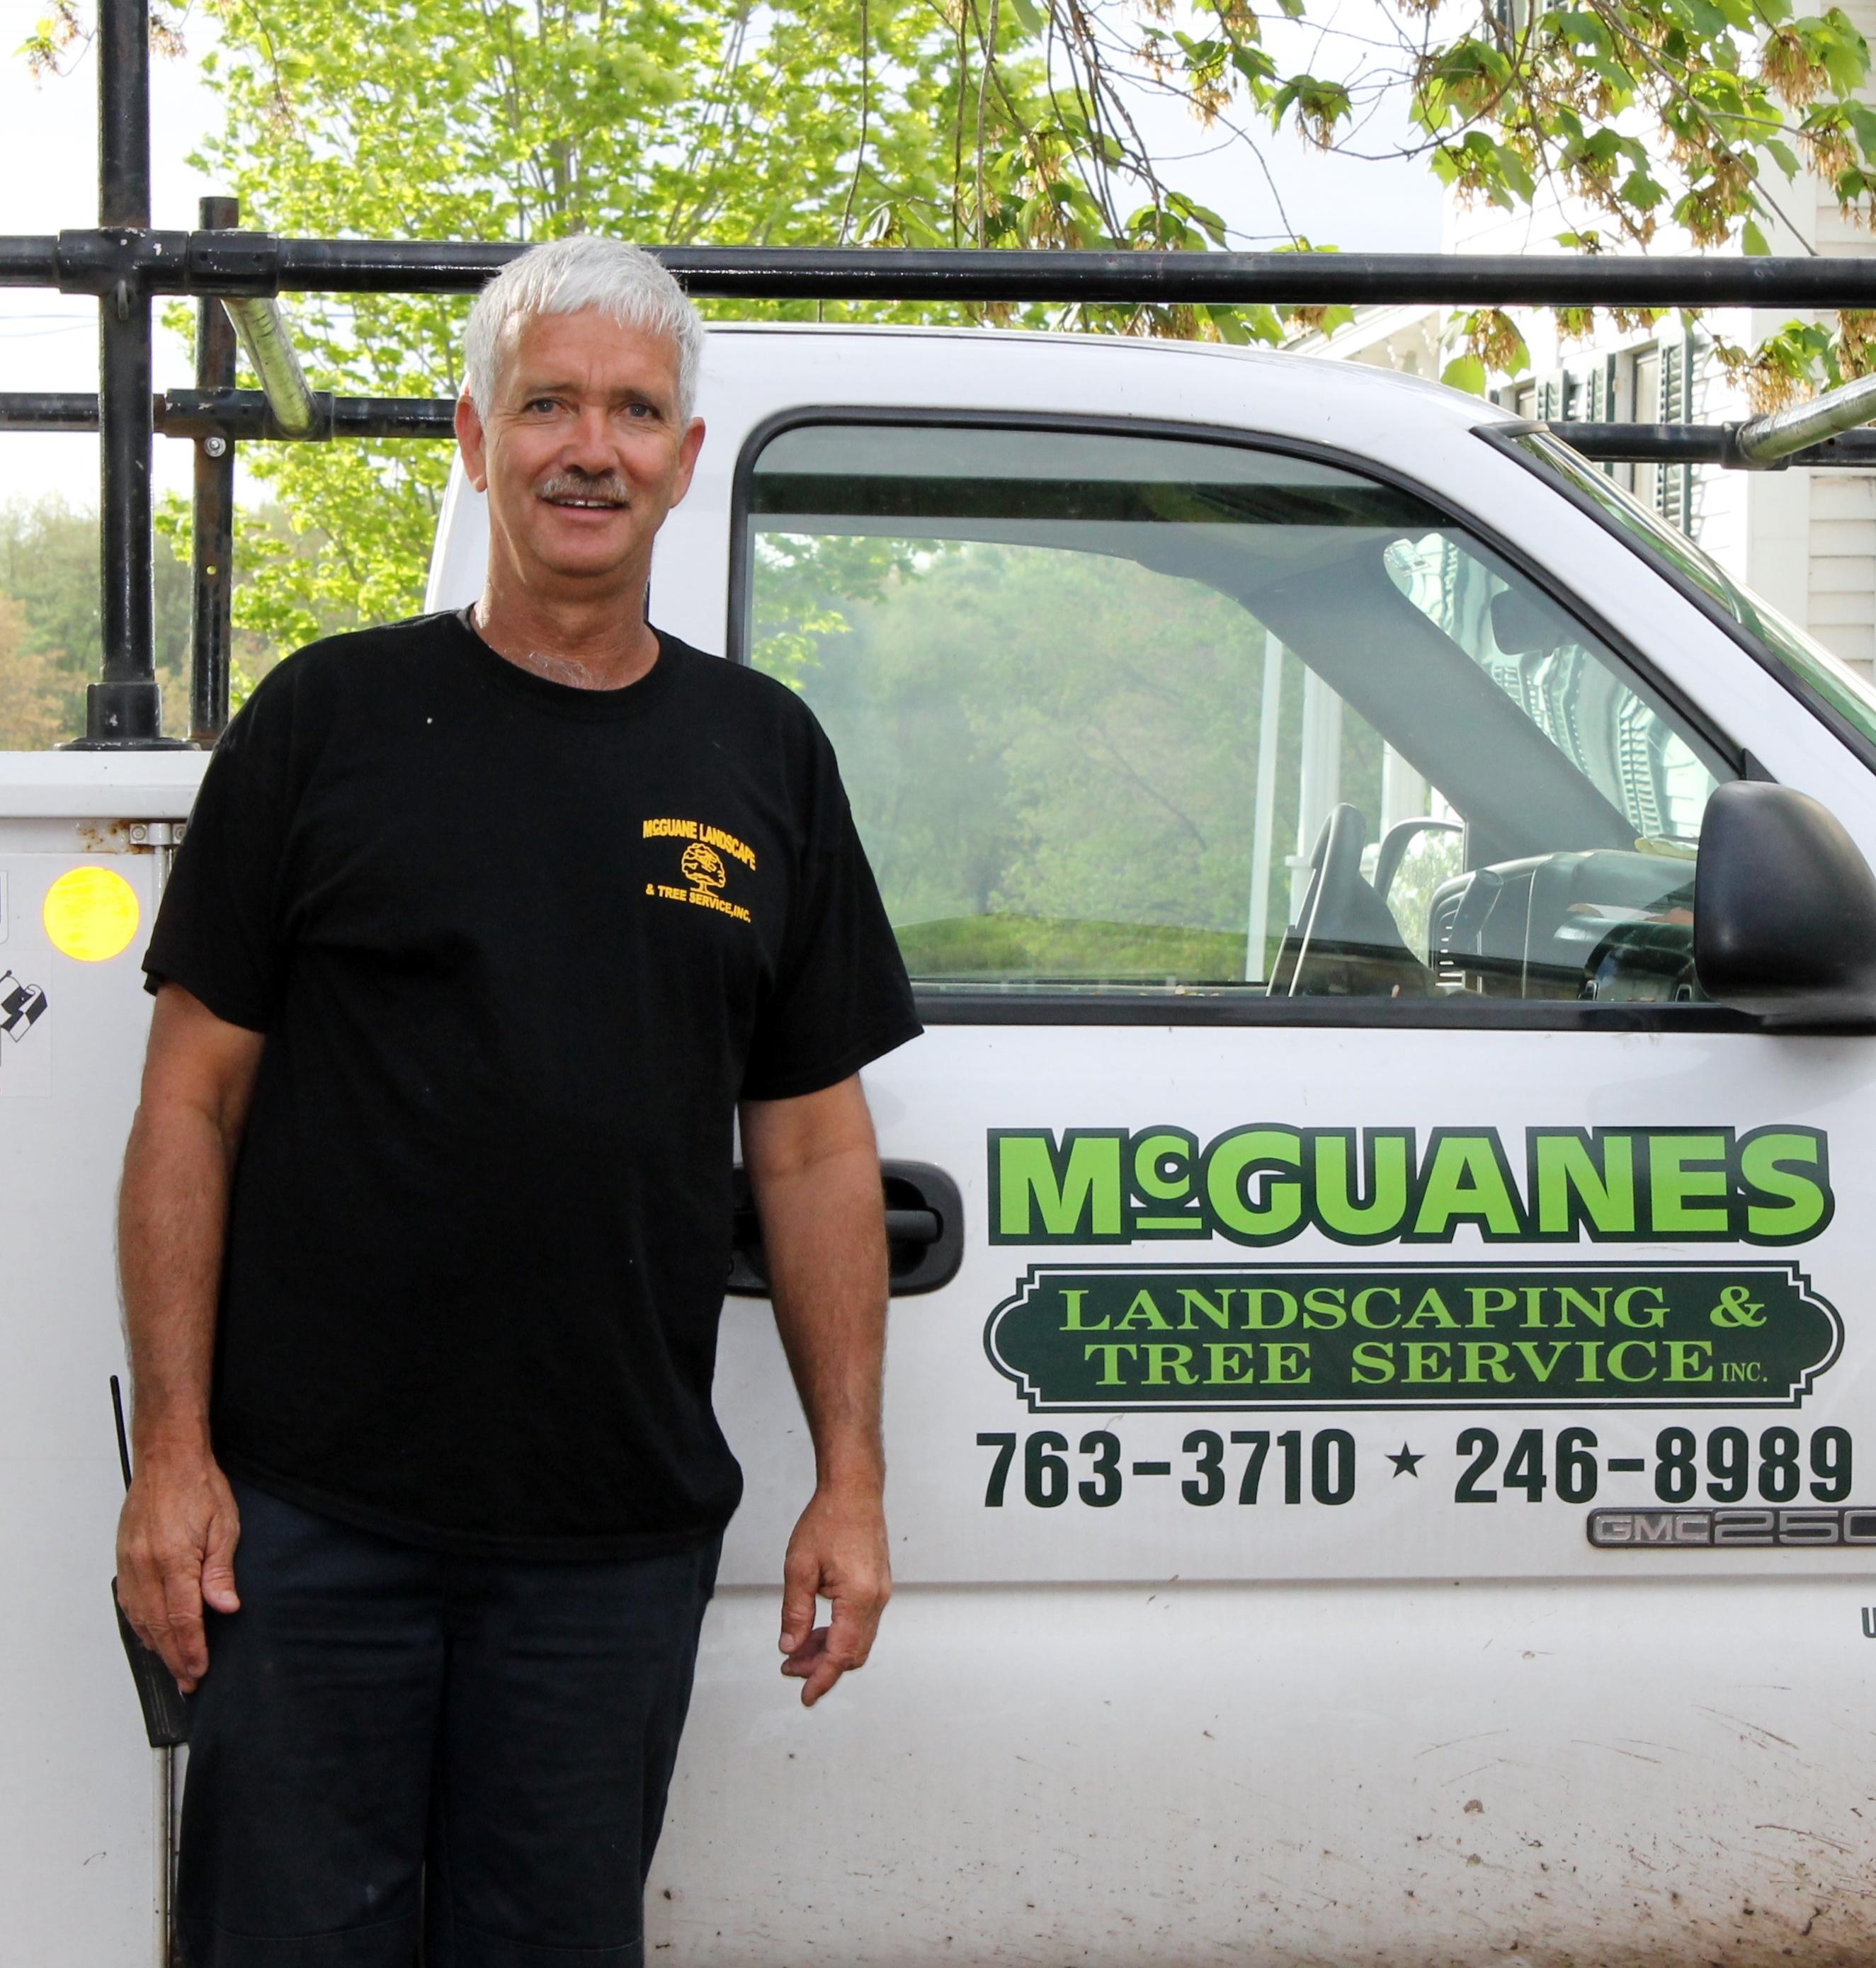 McGuanes_Company_imgage_MartinM2.jpg